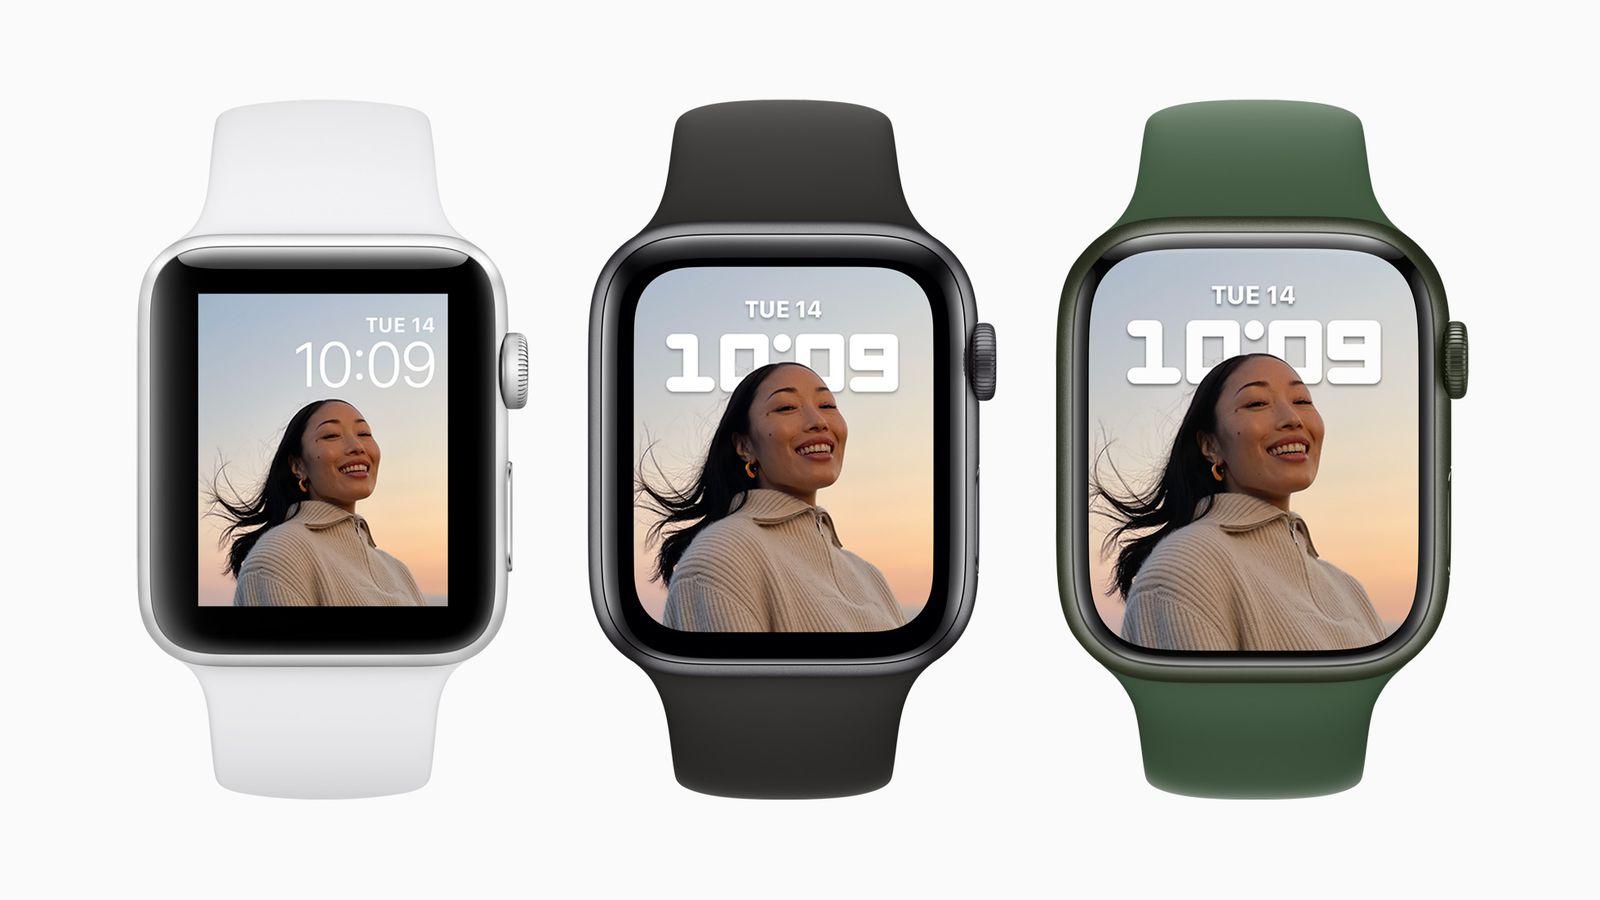 apple-watch-series-7-design-compared.jpg